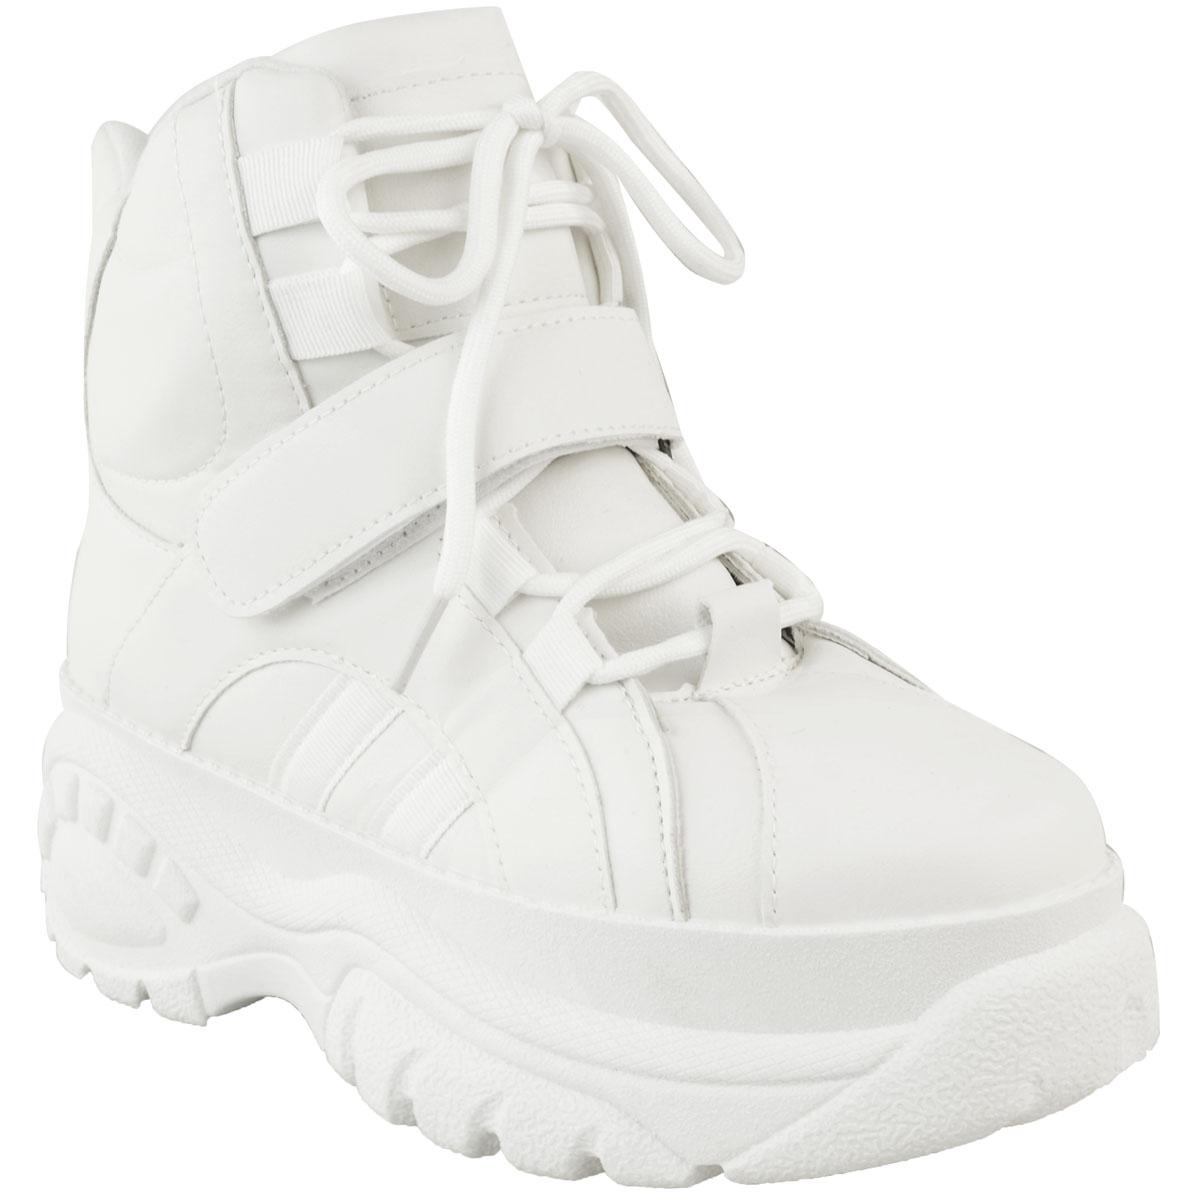 Womens-Ladies-High-Platform-Trainers-Sneakers-Retro-Boots-Hi-Top-Wedge-Punk-Goth thumbnail 8